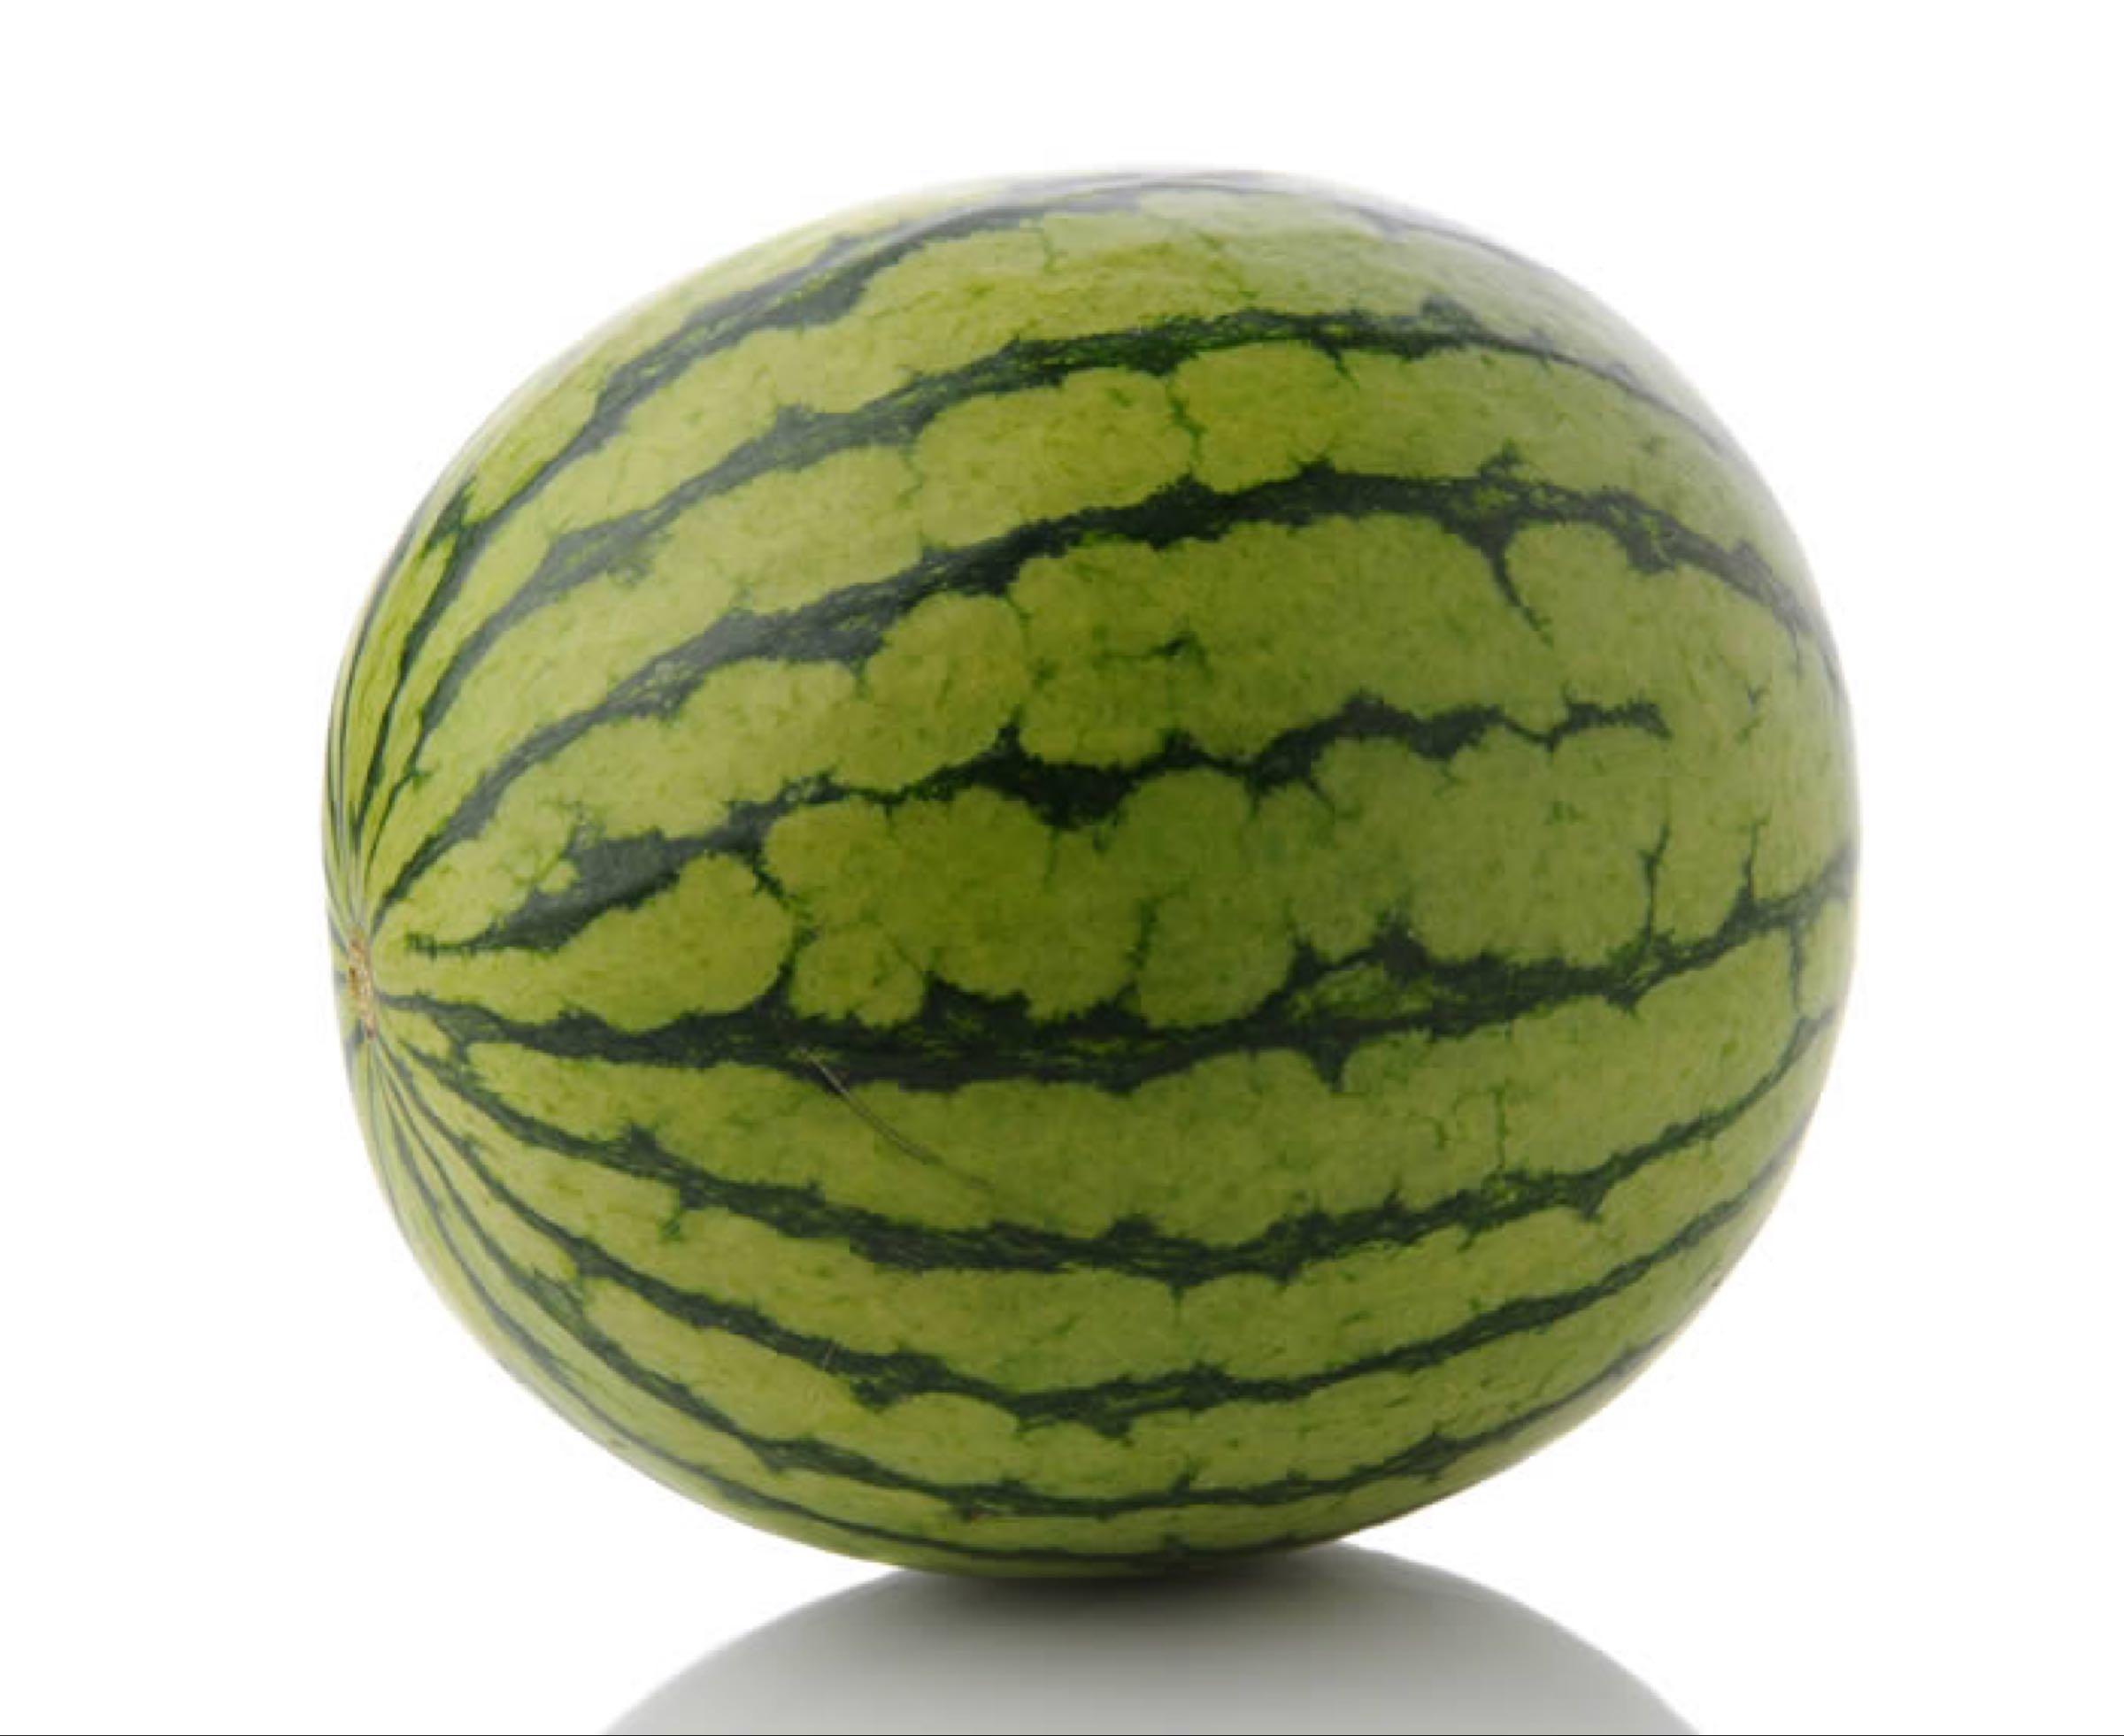 Large fresh Watermelon